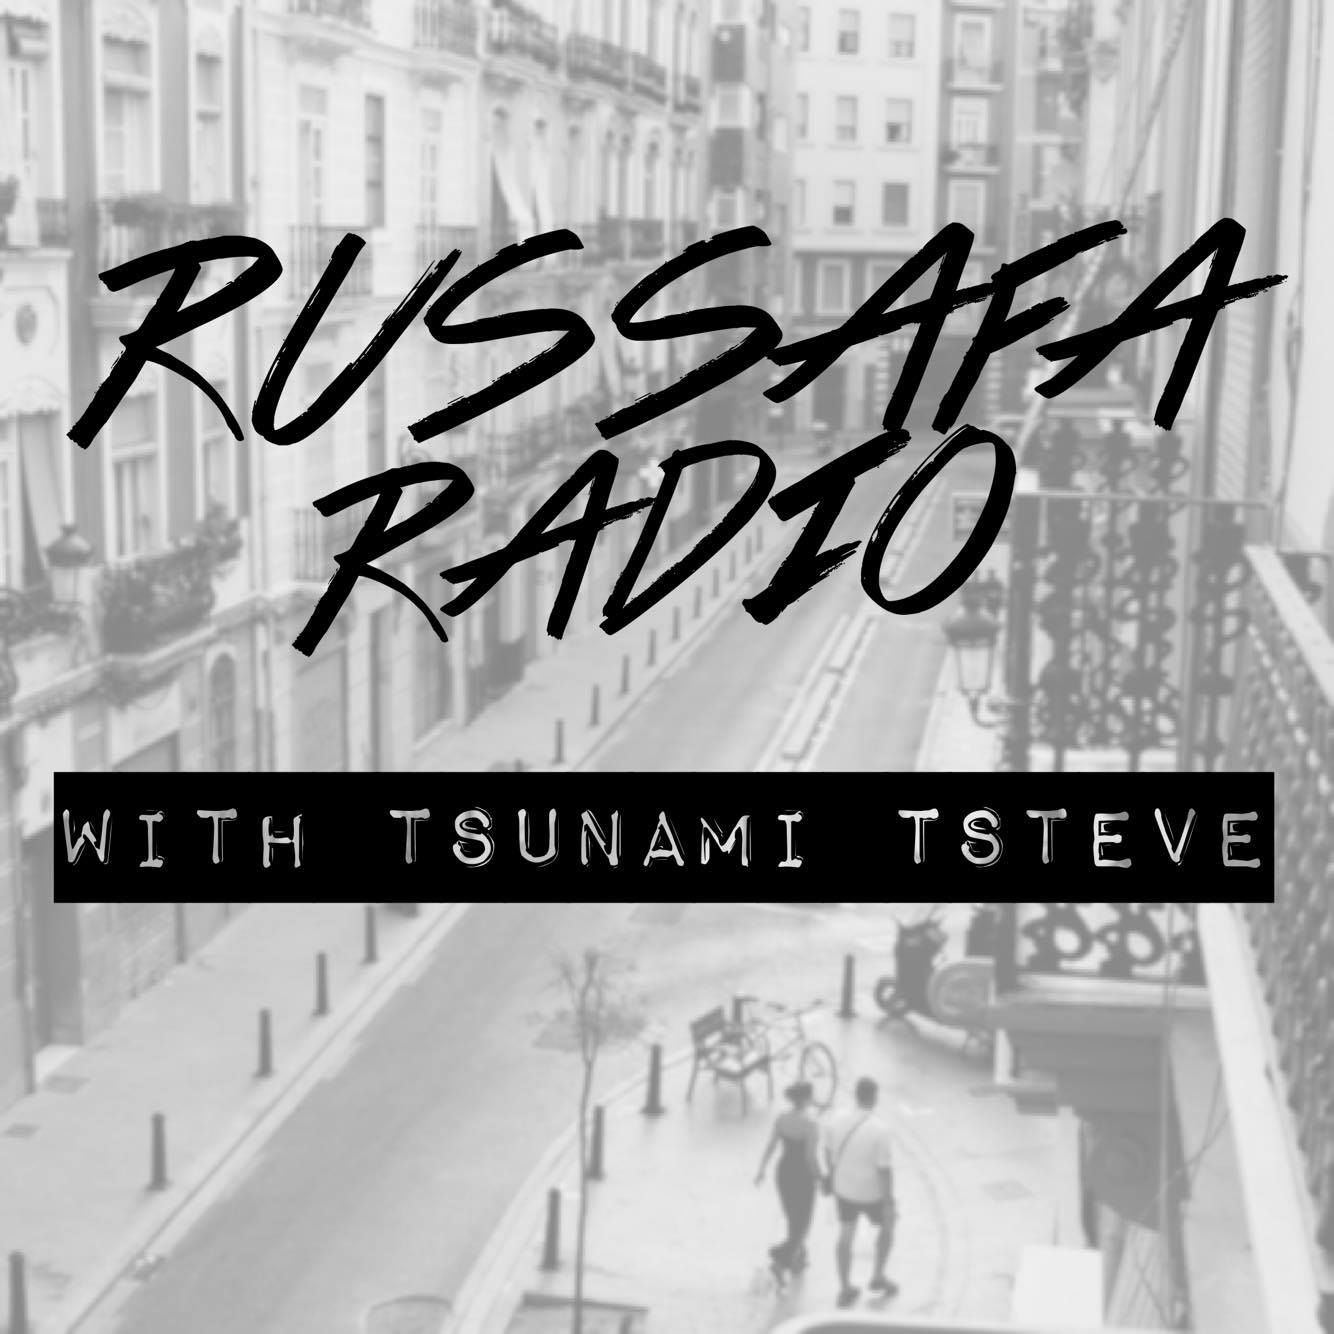 Tsunami Tsteve: Russafa Radio